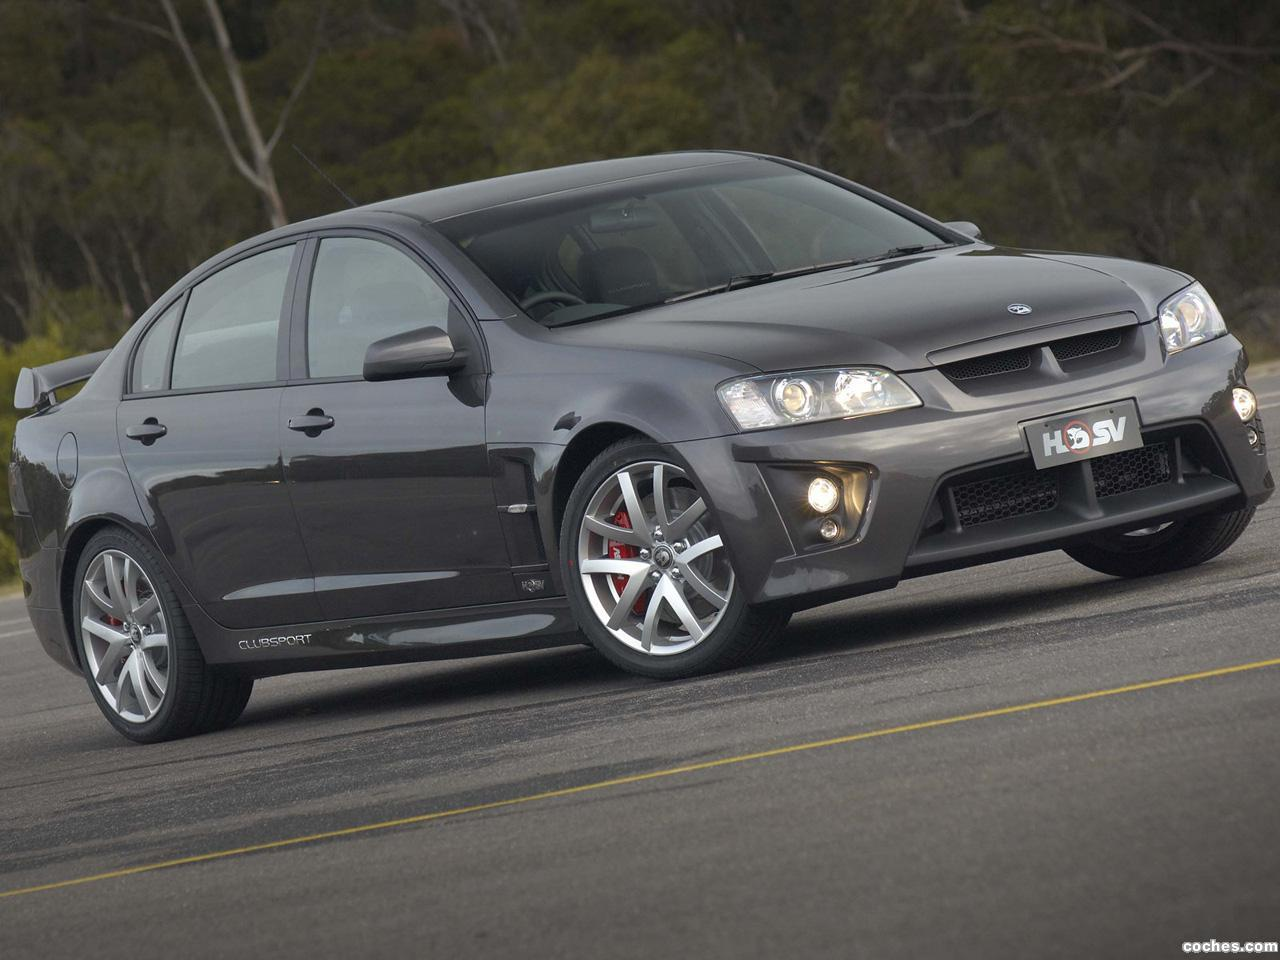 Foto 0 de Holden HSV Clubsport R8 2006